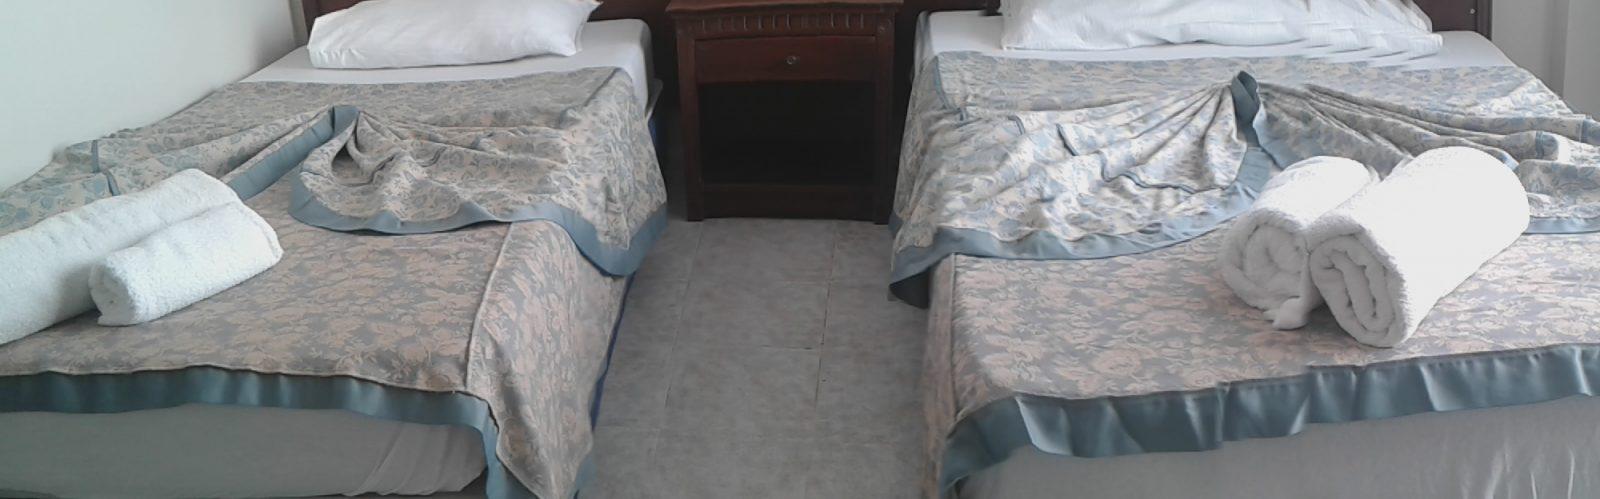 Letovanje Turska autobusom, Kusadasi, Hotel Tecimen,izgled sobe